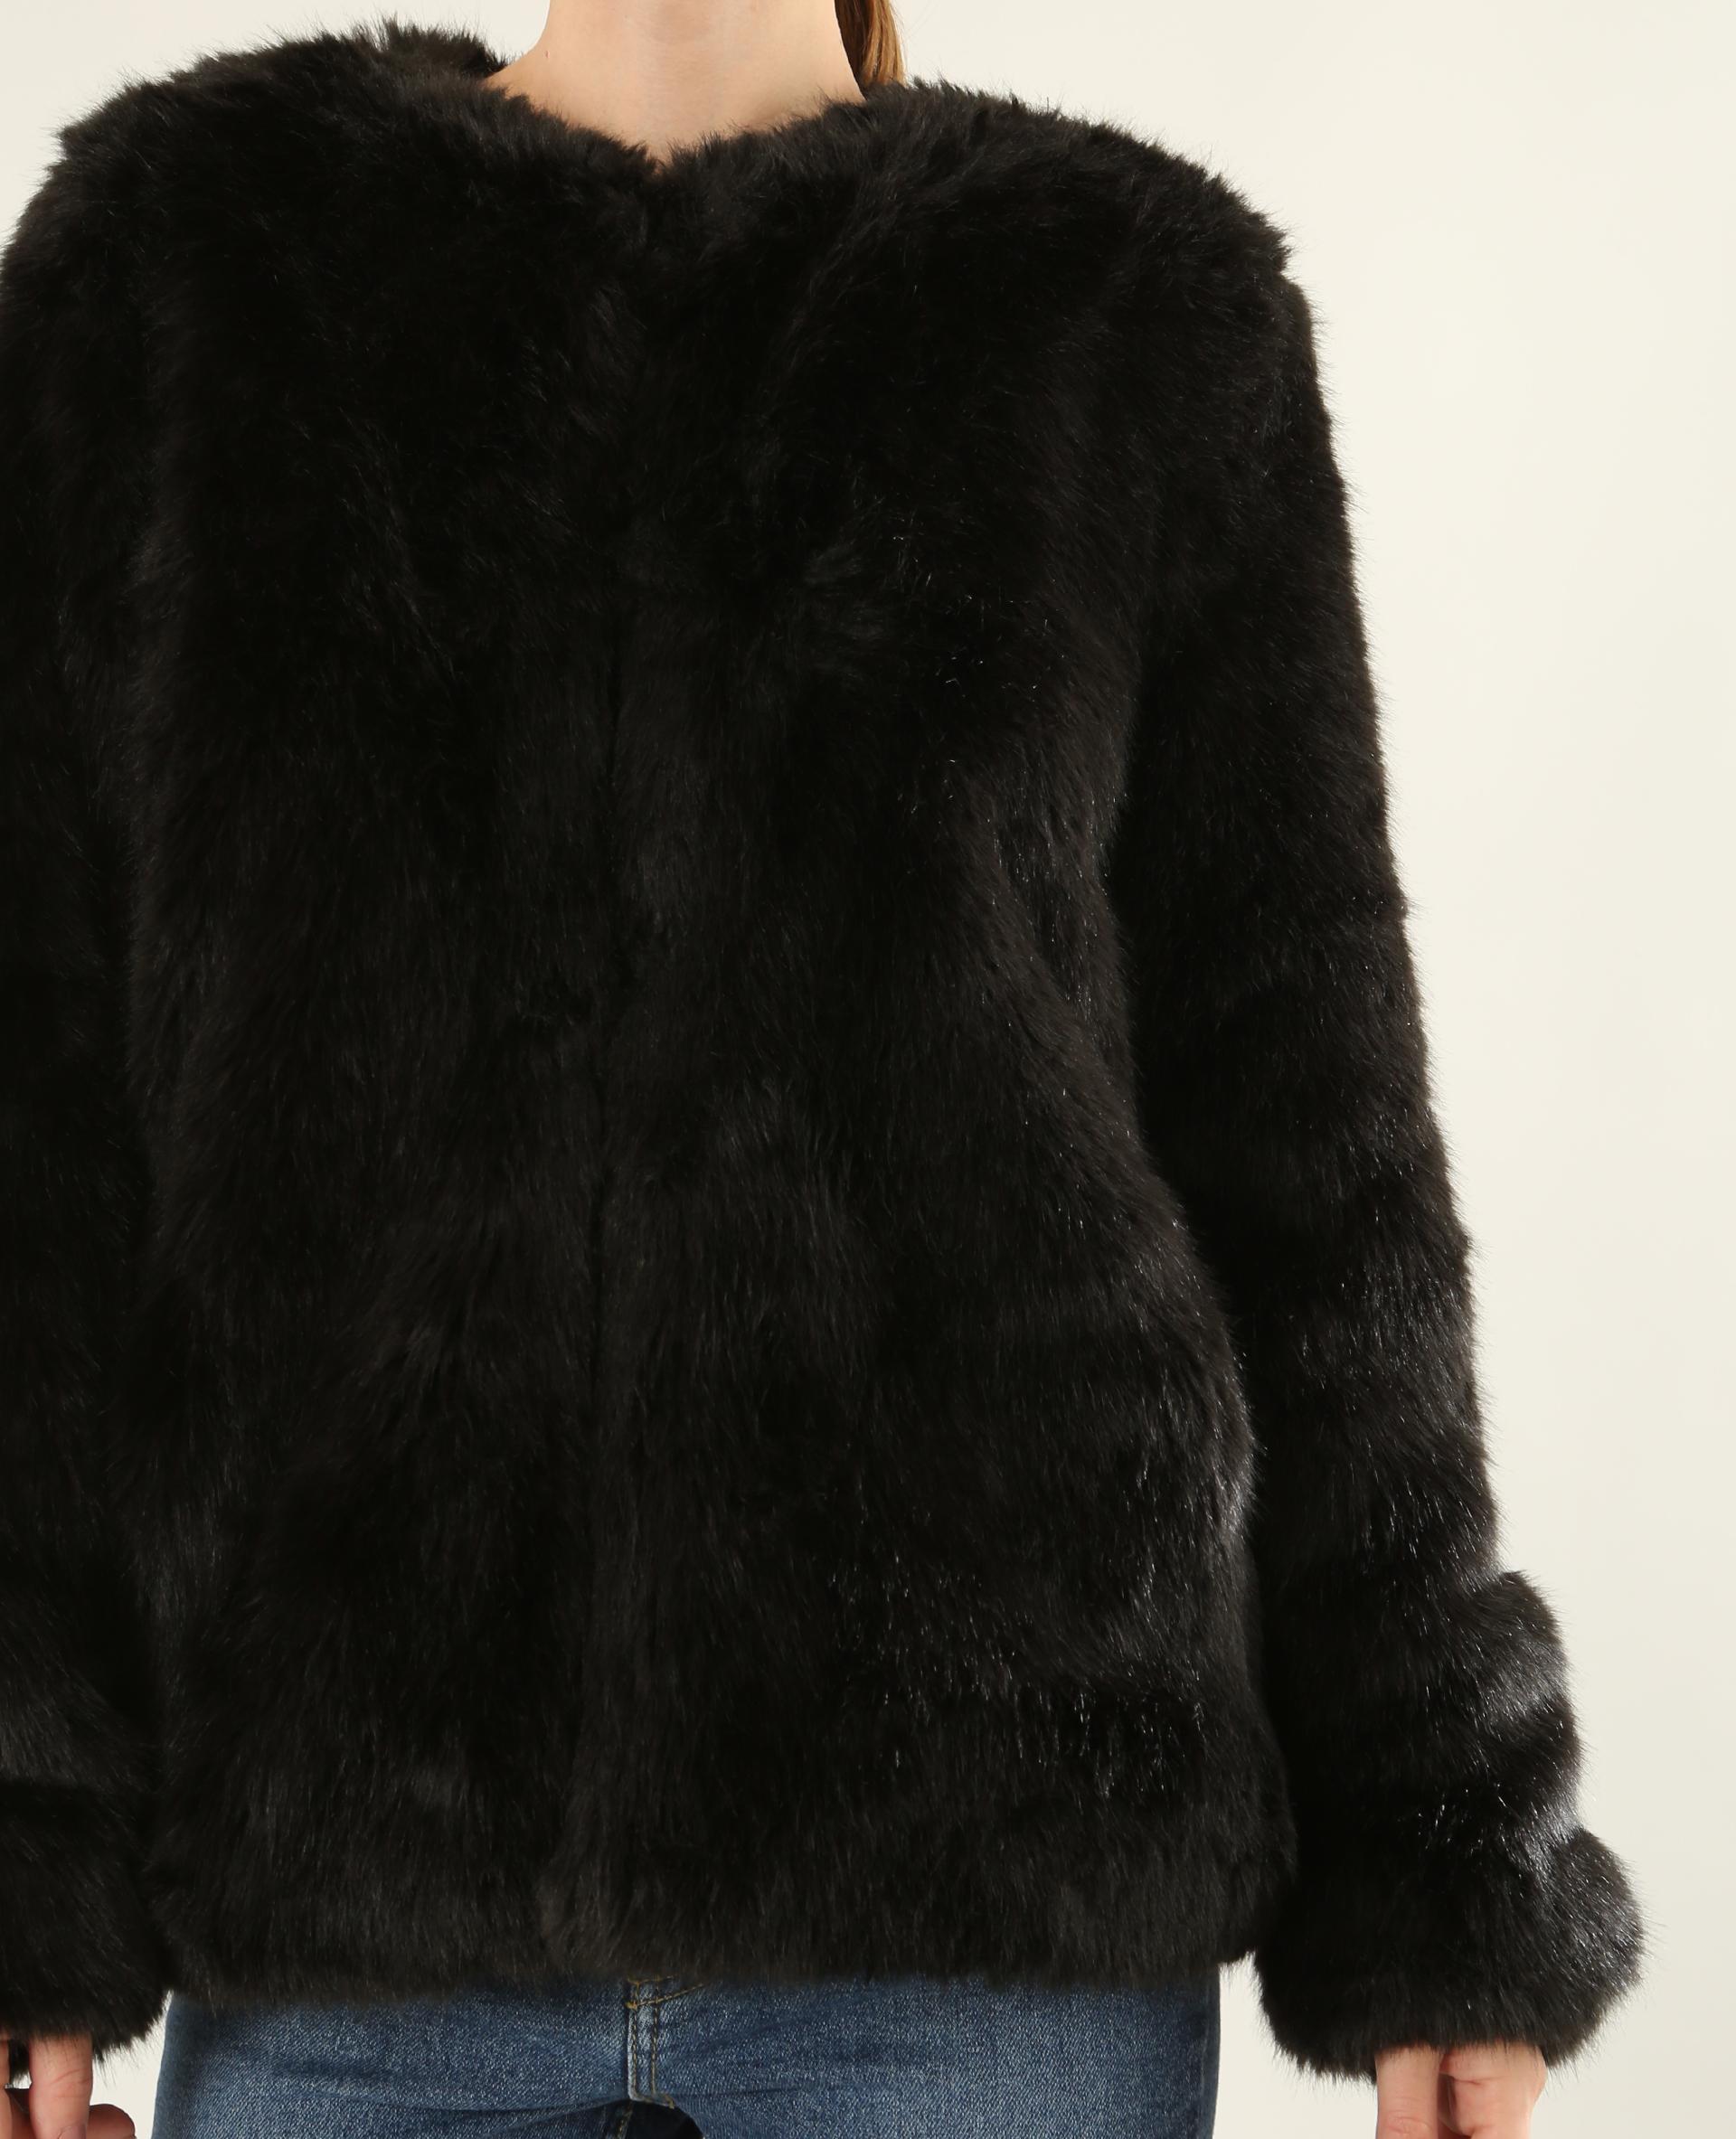 new styles 6575c e4402 Giacca in pelliccia ecologica nero - 280112899A08 | Pimkie